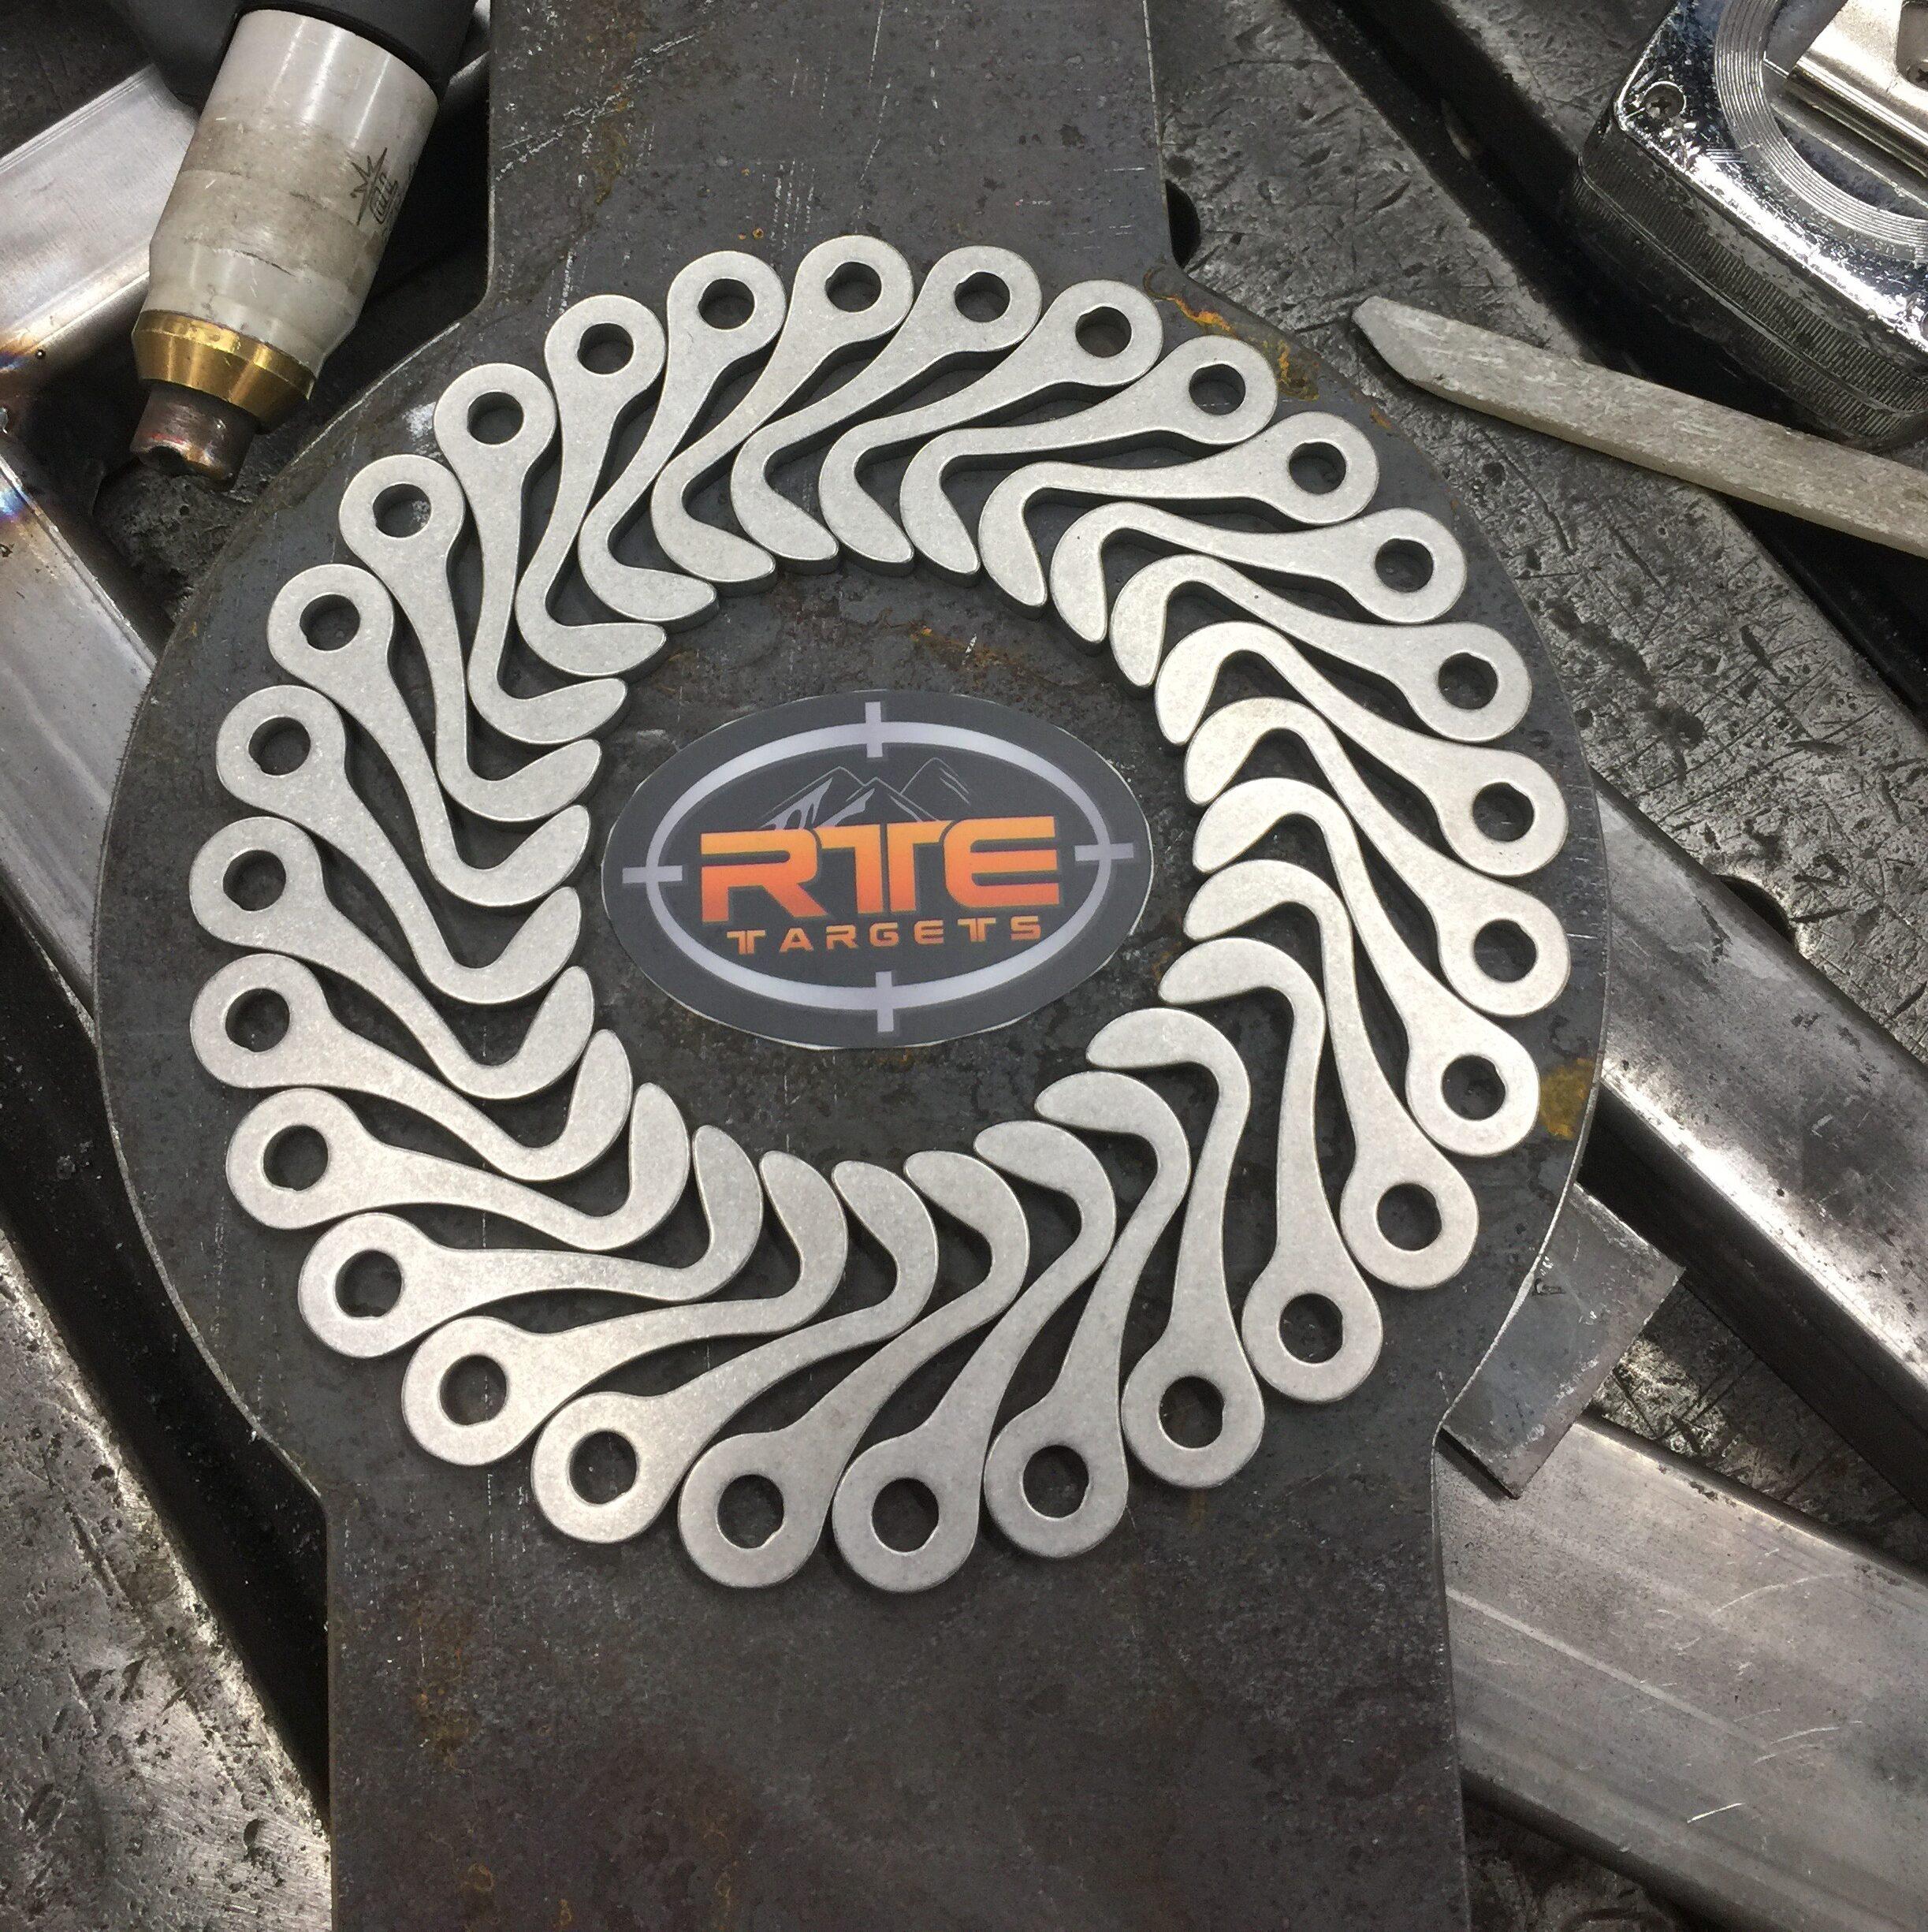 RTE Targets Cutting Capability